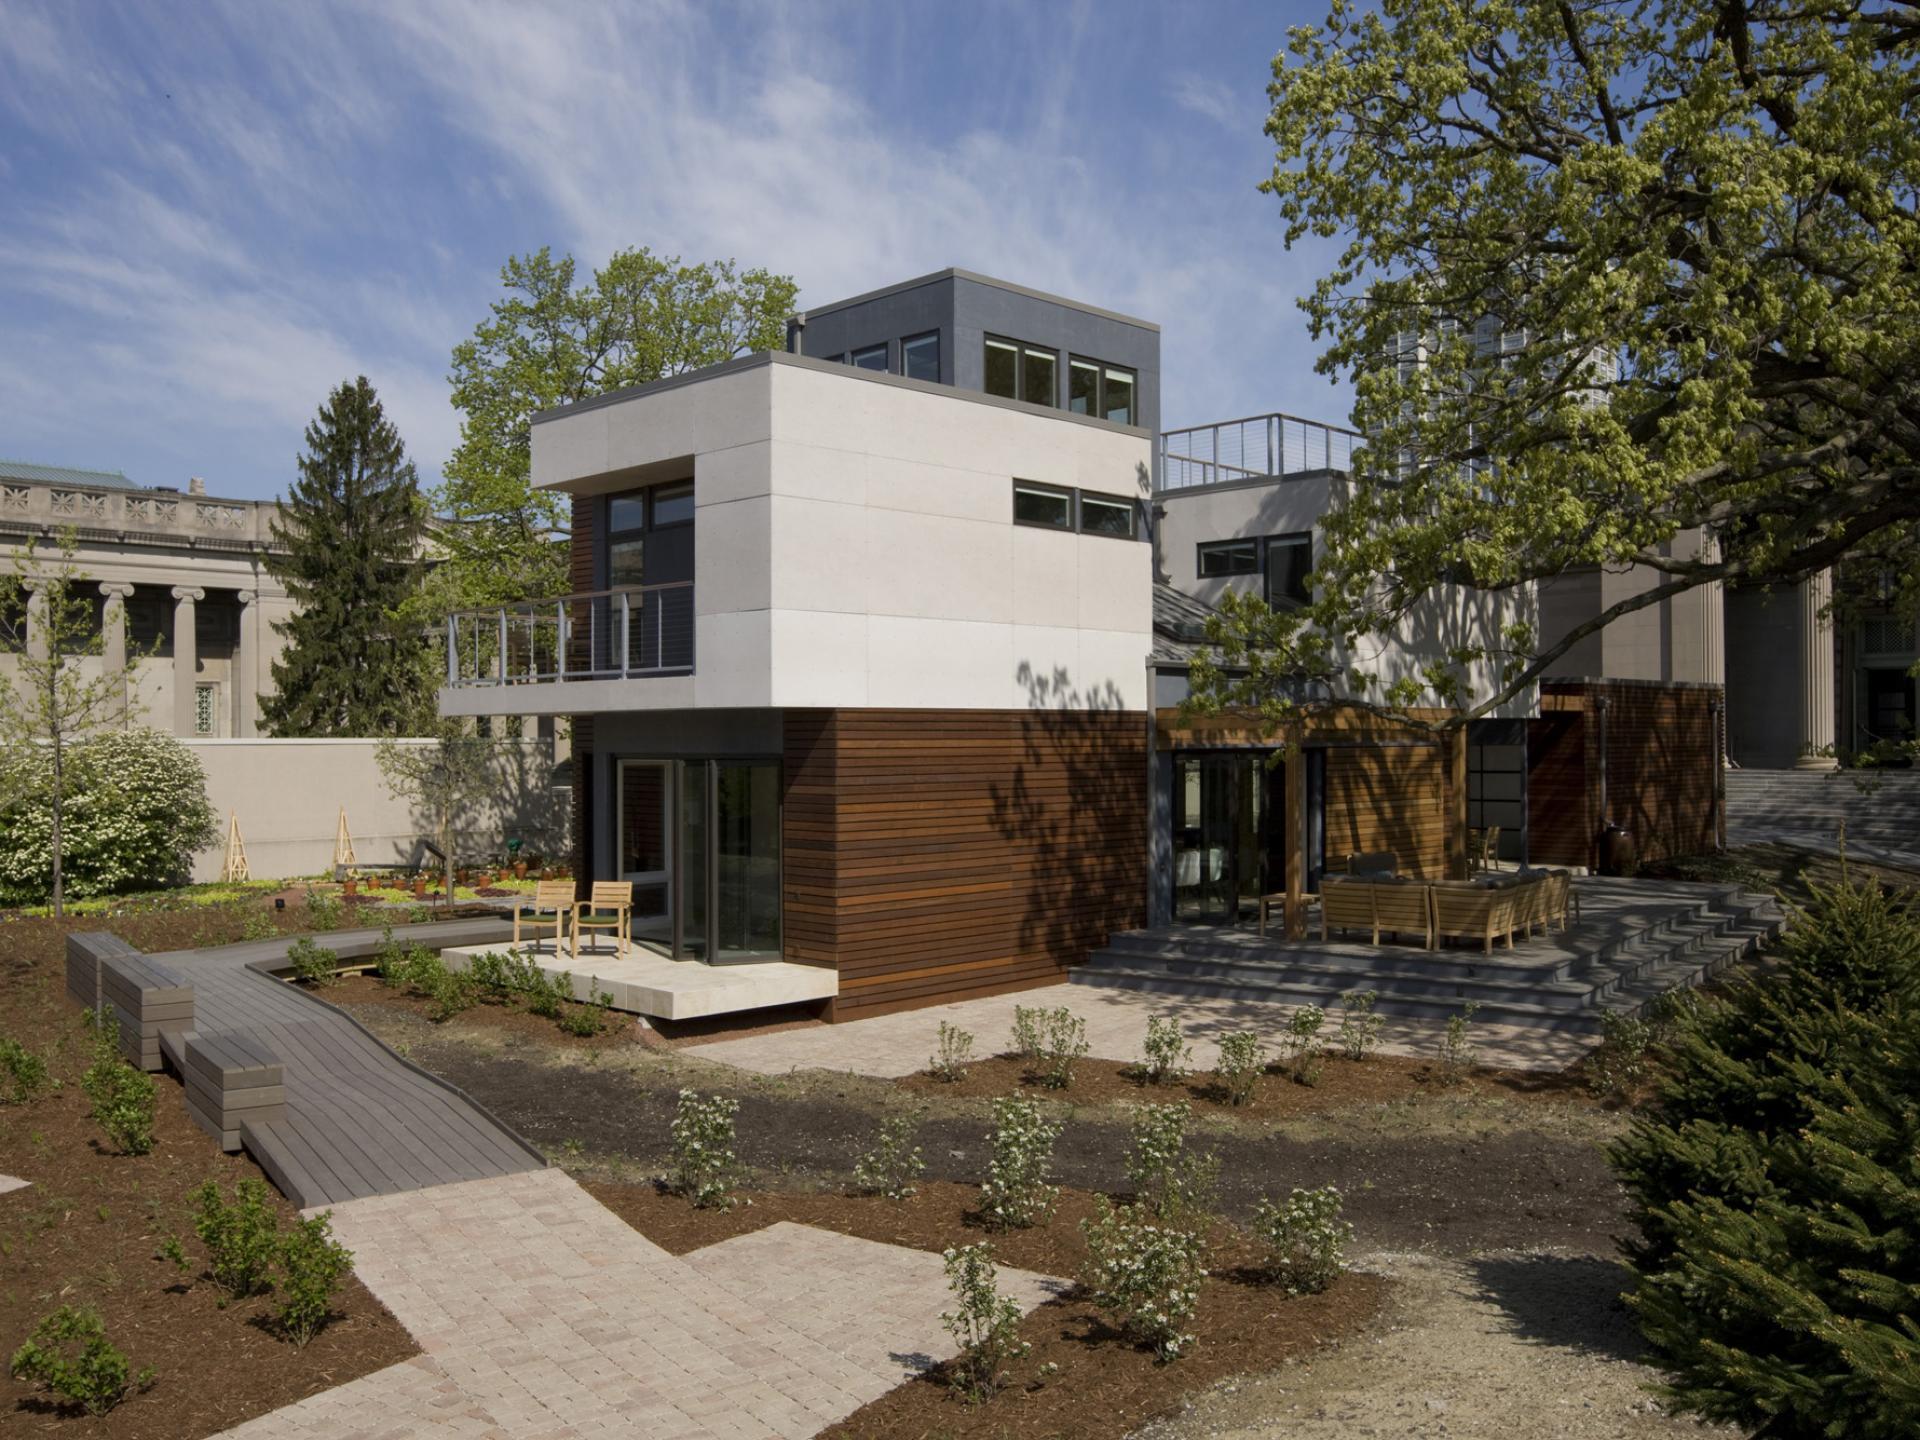 architecture exterior smart home design 423582 wallpaper wallpaper